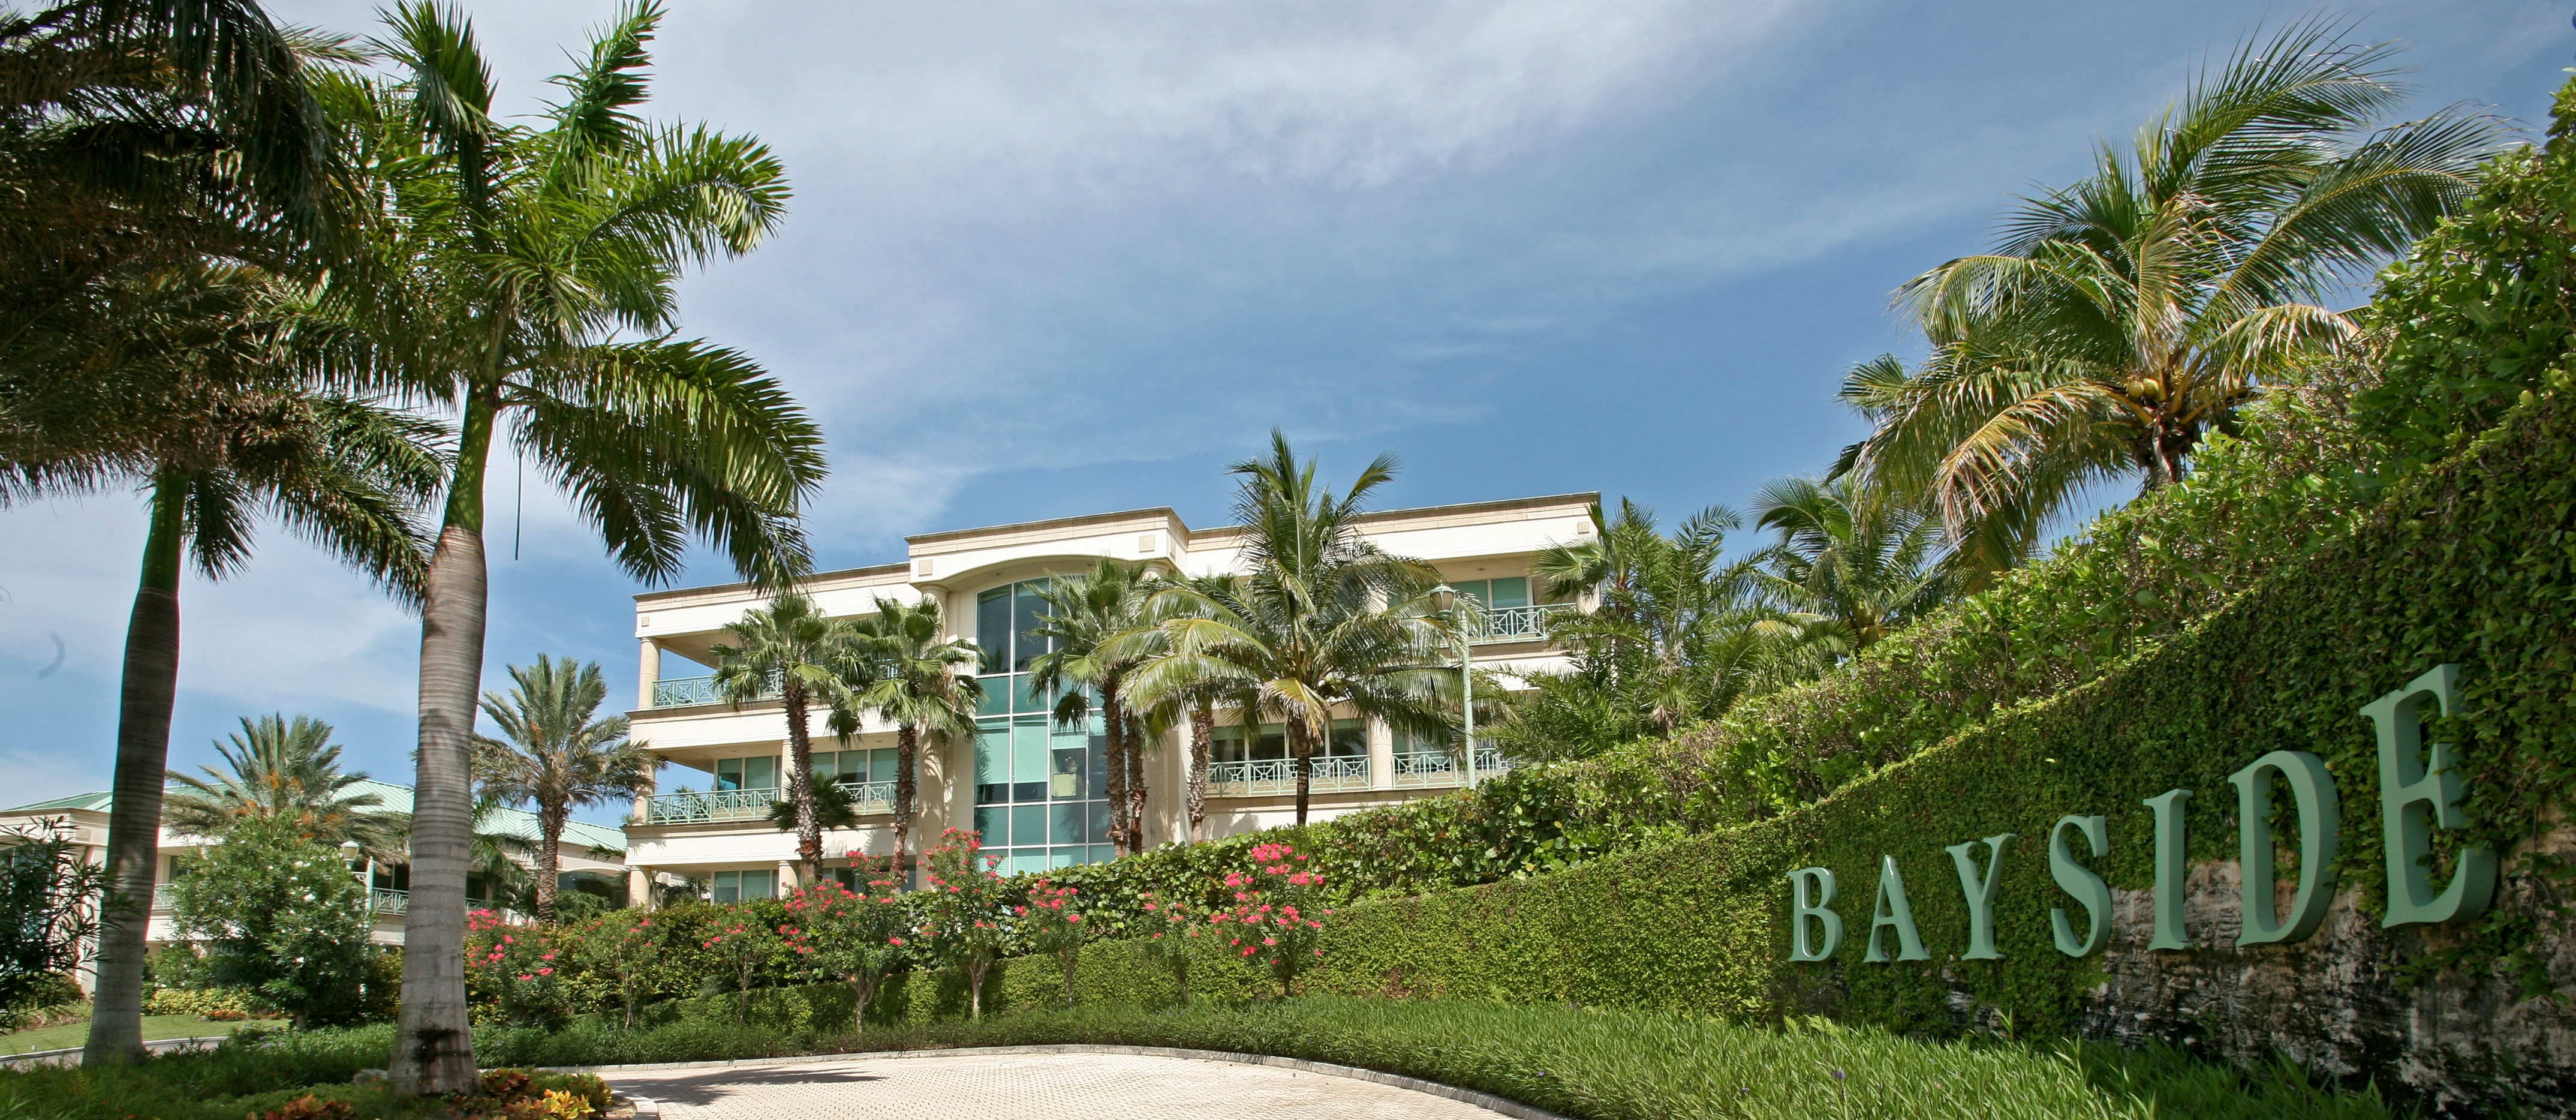 Bayside Bahamas Commercial Building | Bahamas Realty